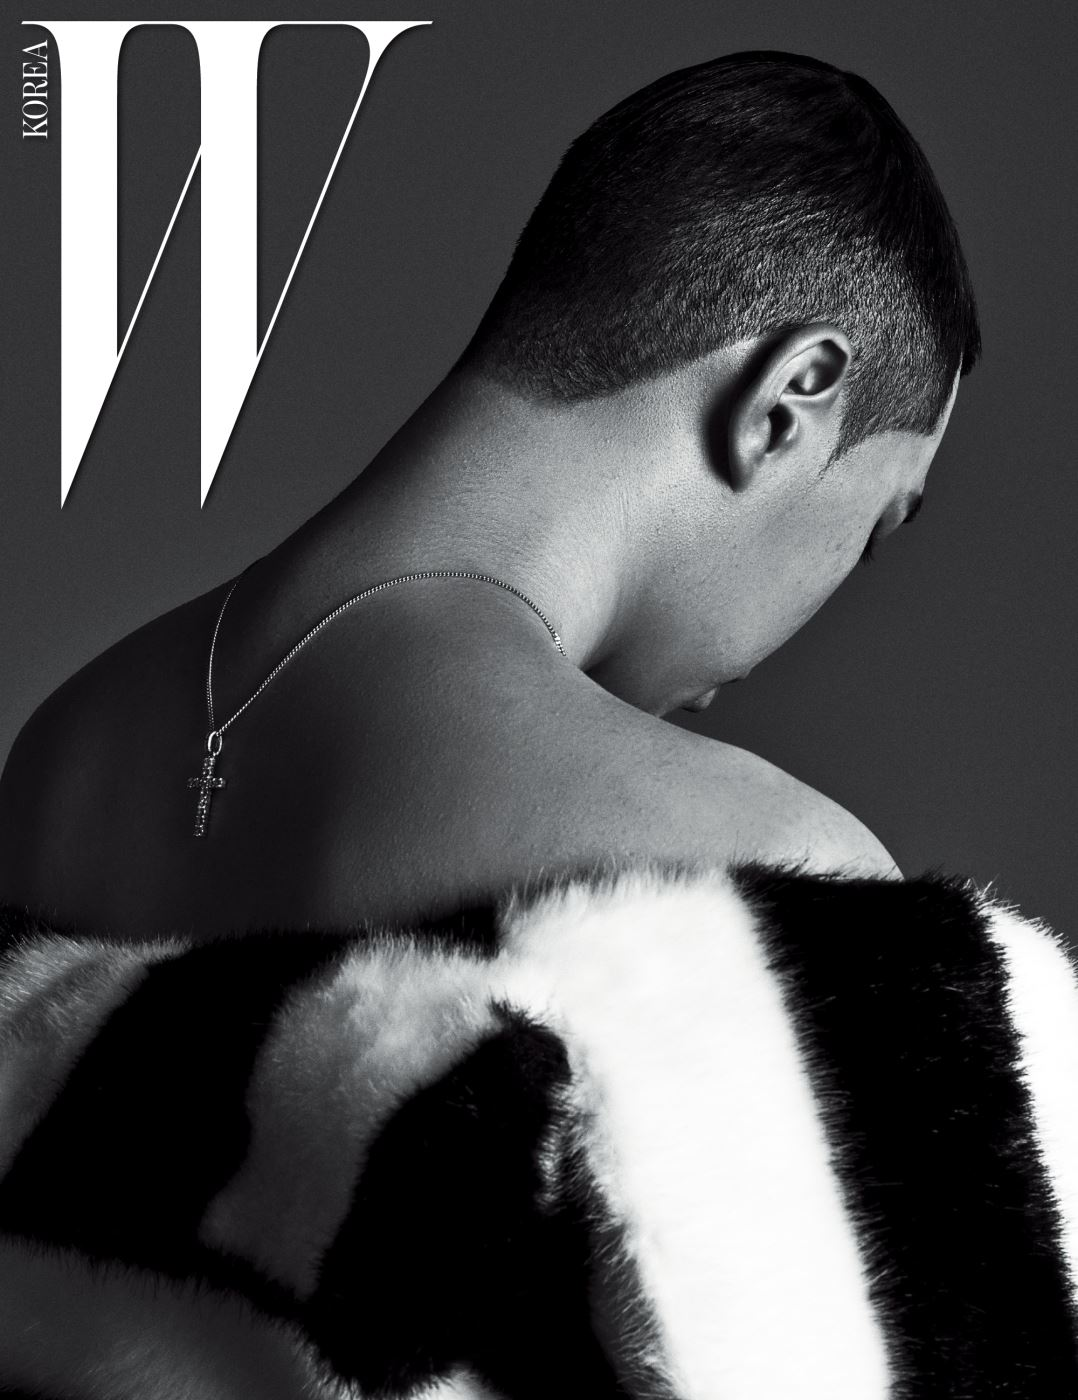 WK 1609-비와이1